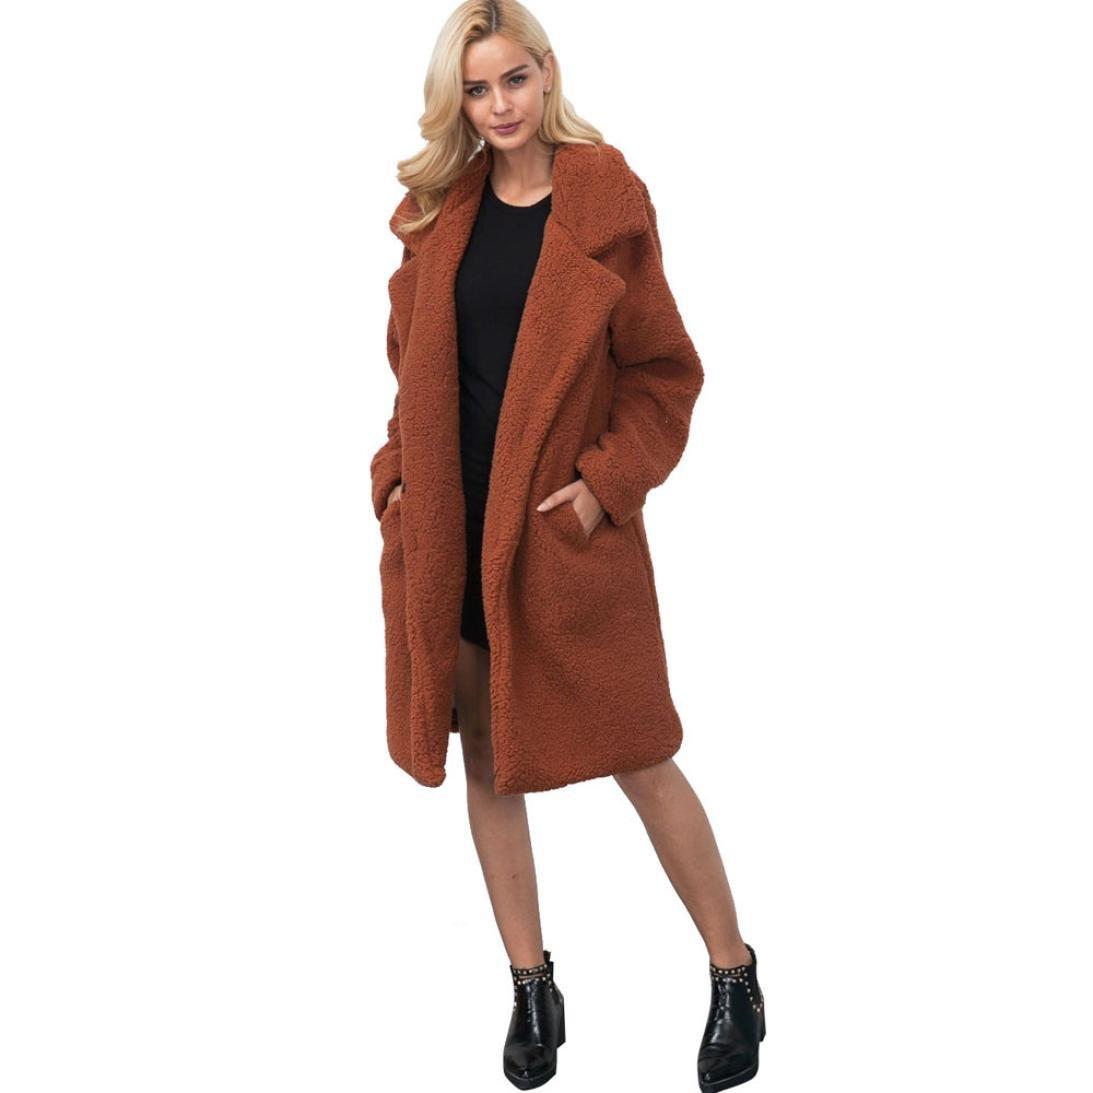 Sunward Apparel Womens Fuzzy Faux Lamb Fur Coat Long Jacket Notched Lapel Mid Long Coat 54sgvd